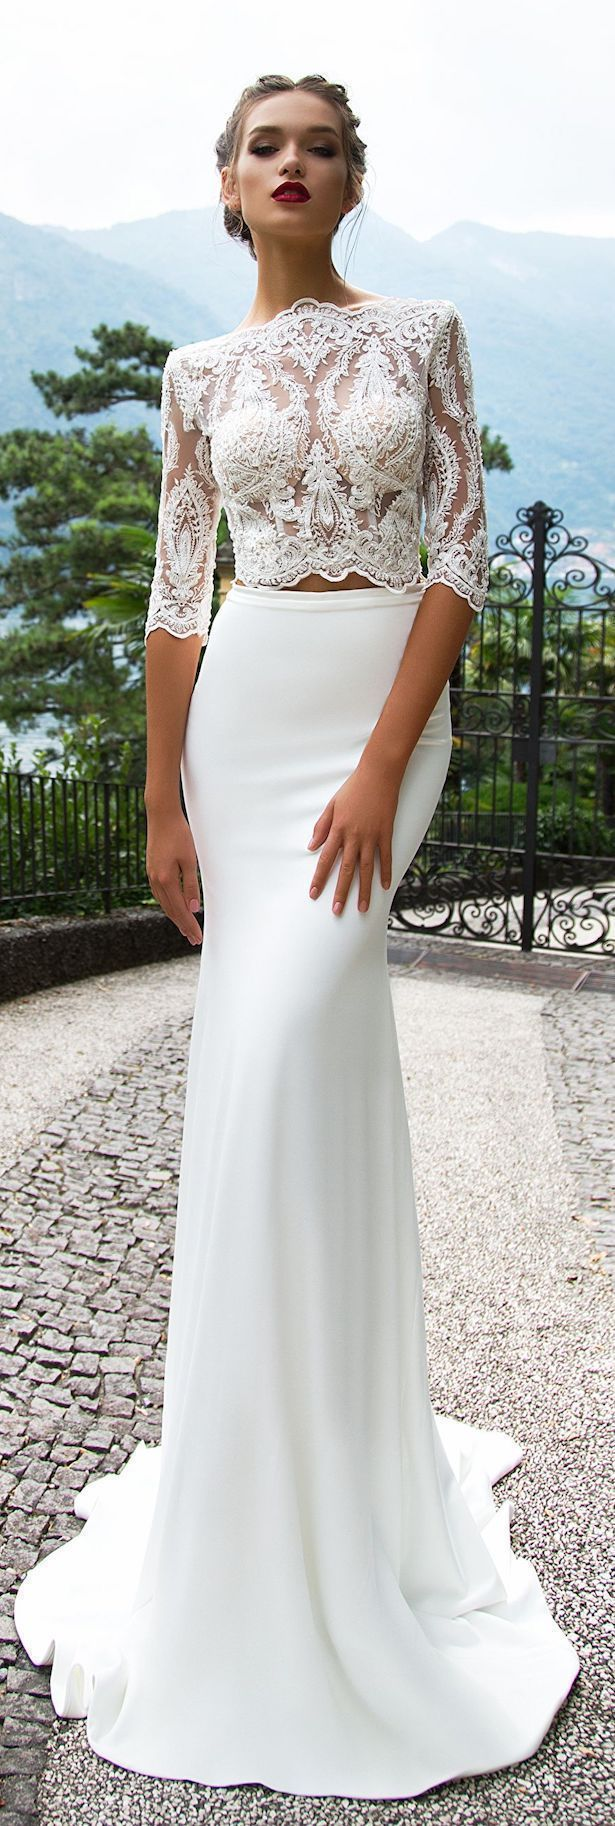 Wedding Dress by Milla Nova White Desire 2017 Bridal Collection ...